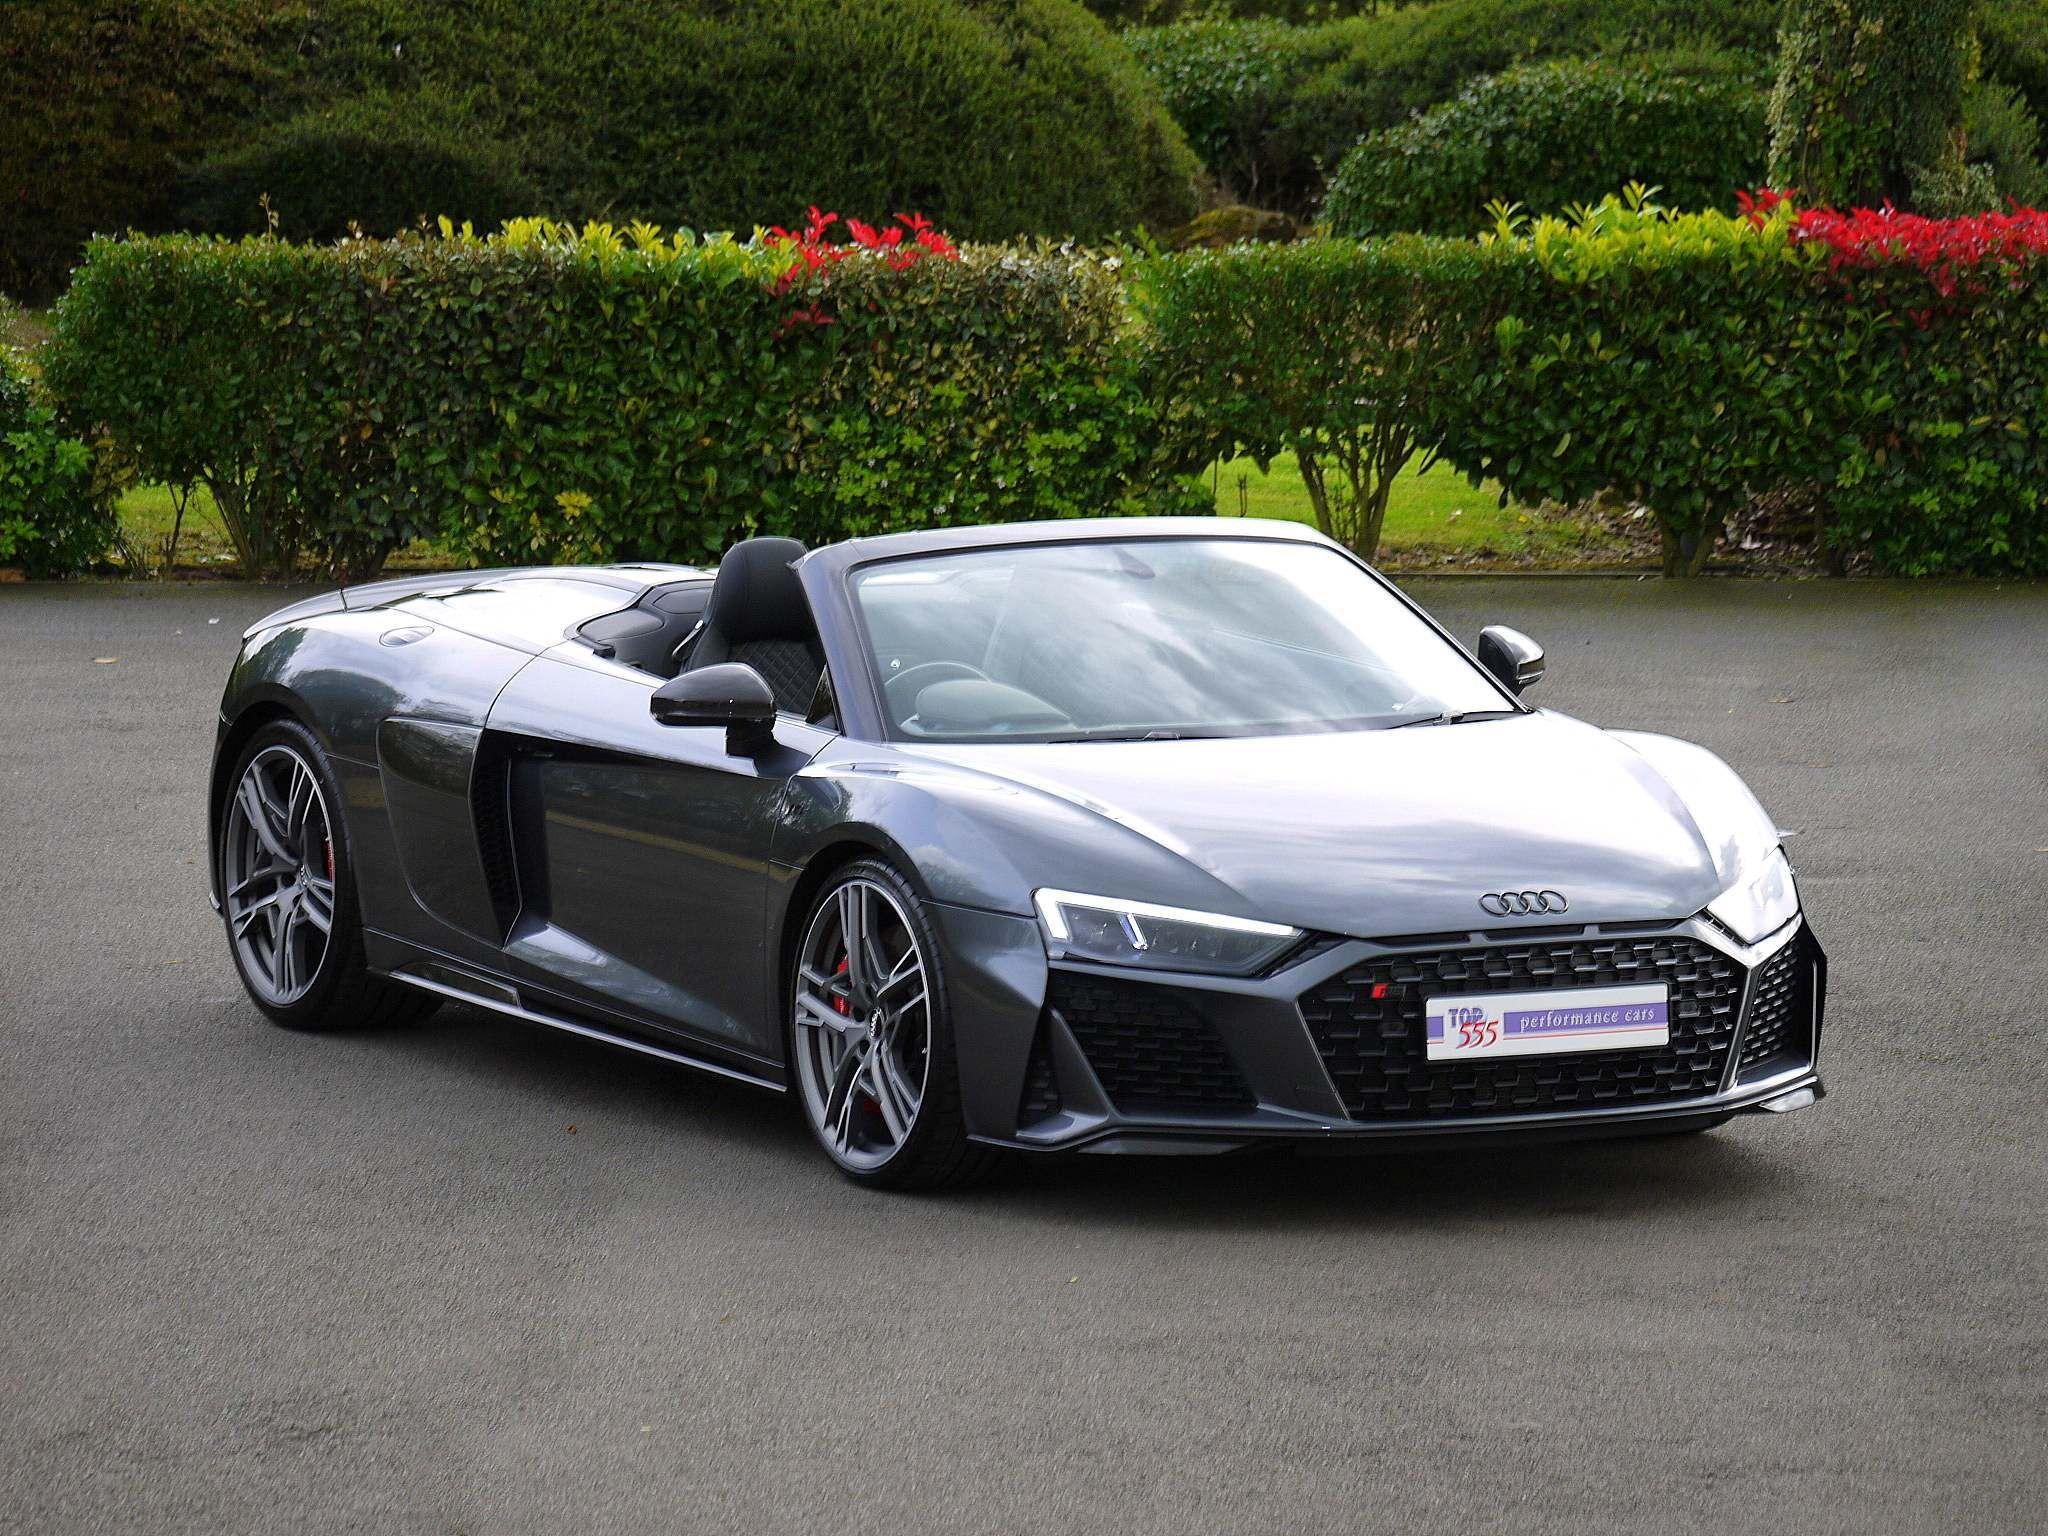 Audi R8 Performance Carbon Black Used Cars For Sale Autotrader Uk